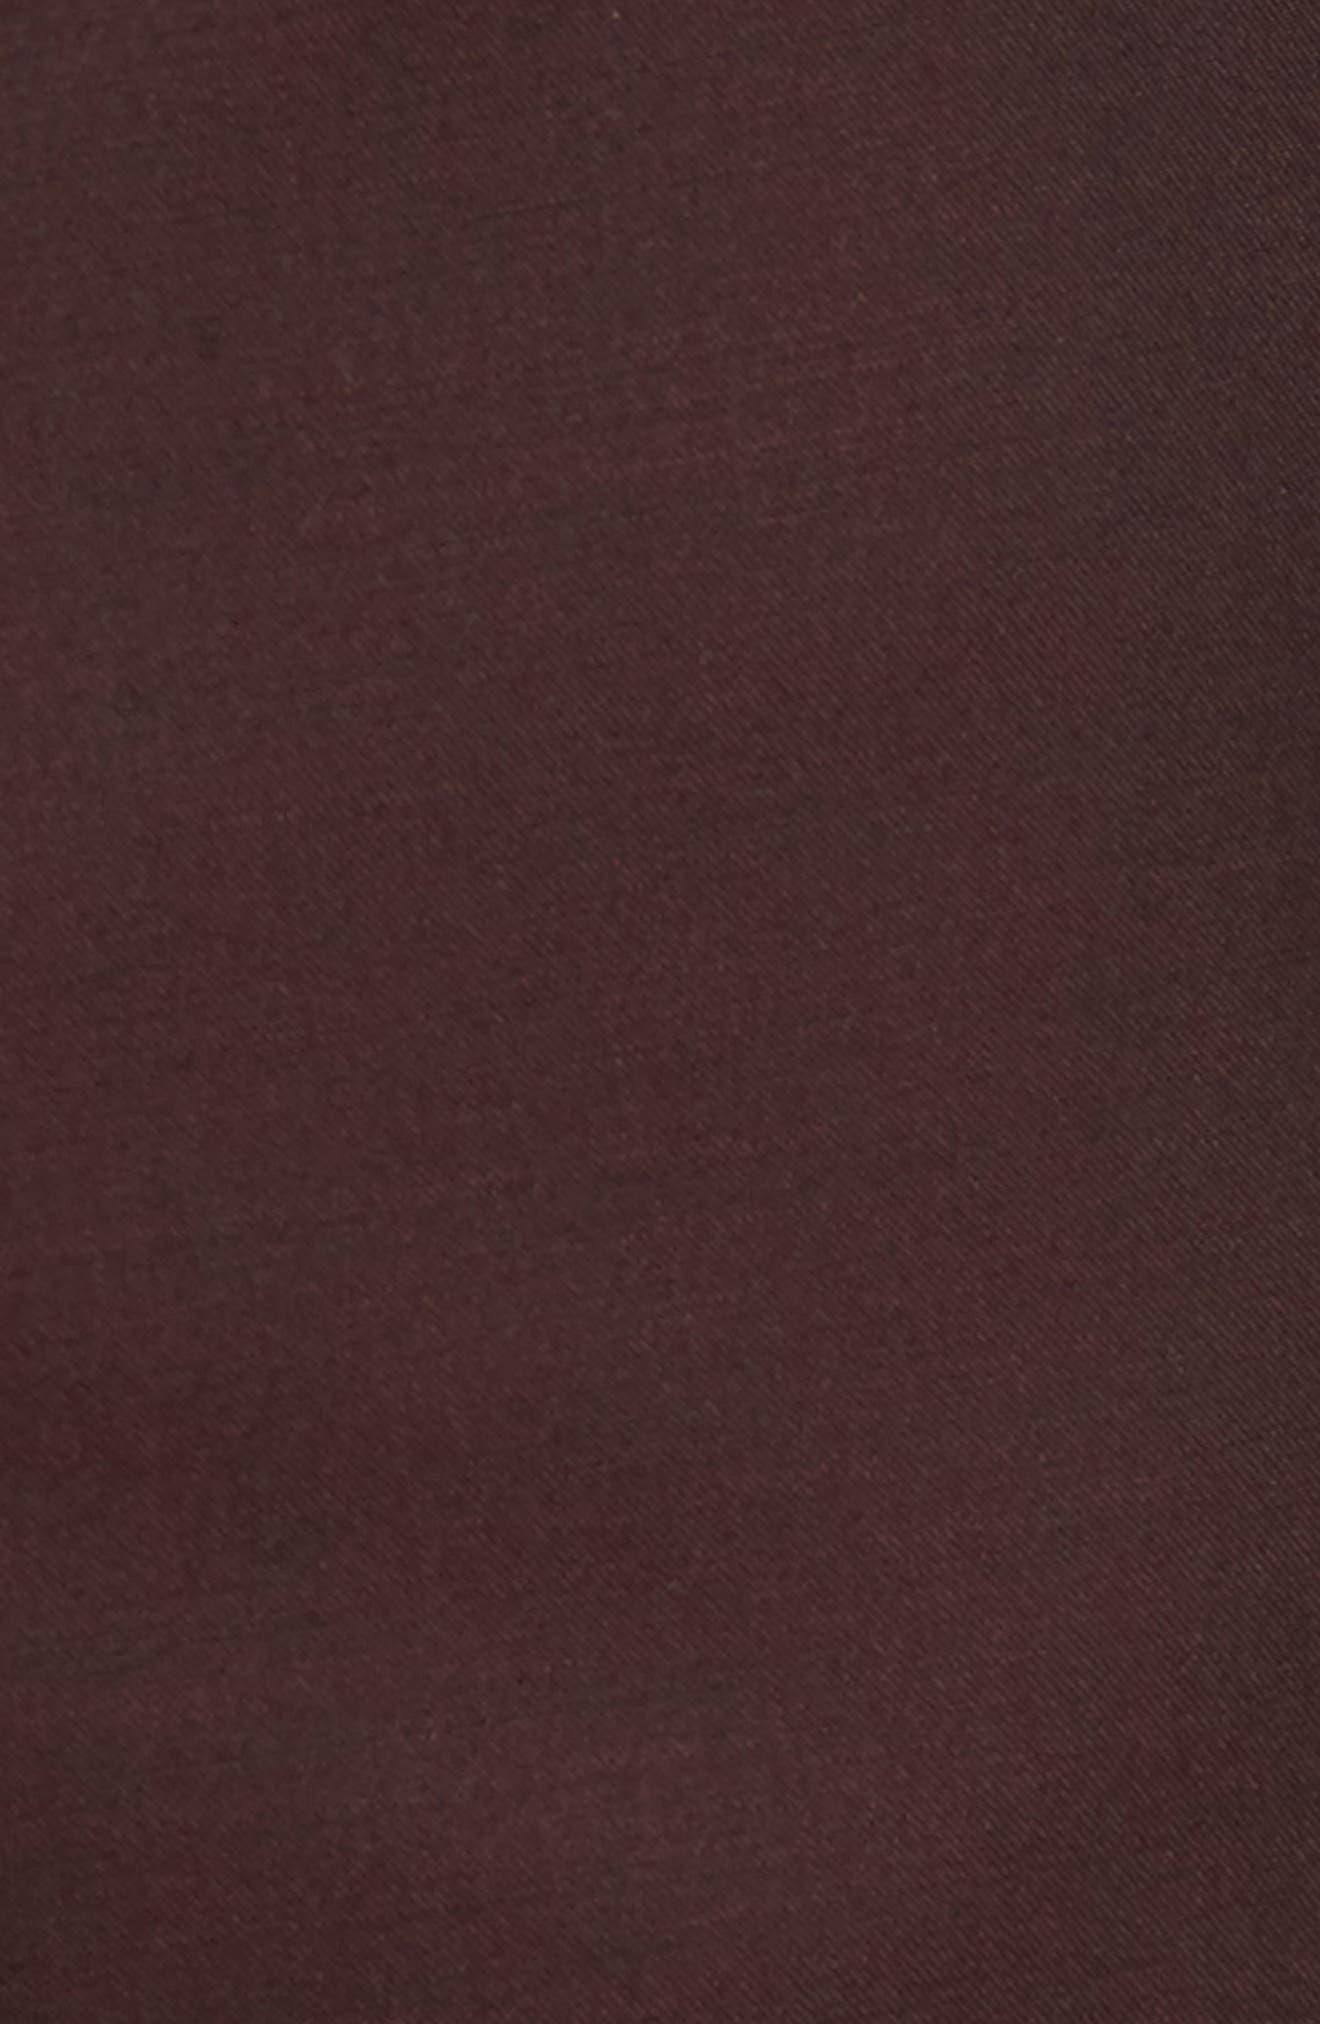 Capstone Slim Fit Tuxedo Trousers,                             Alternate thumbnail 5, color,                             MAROON